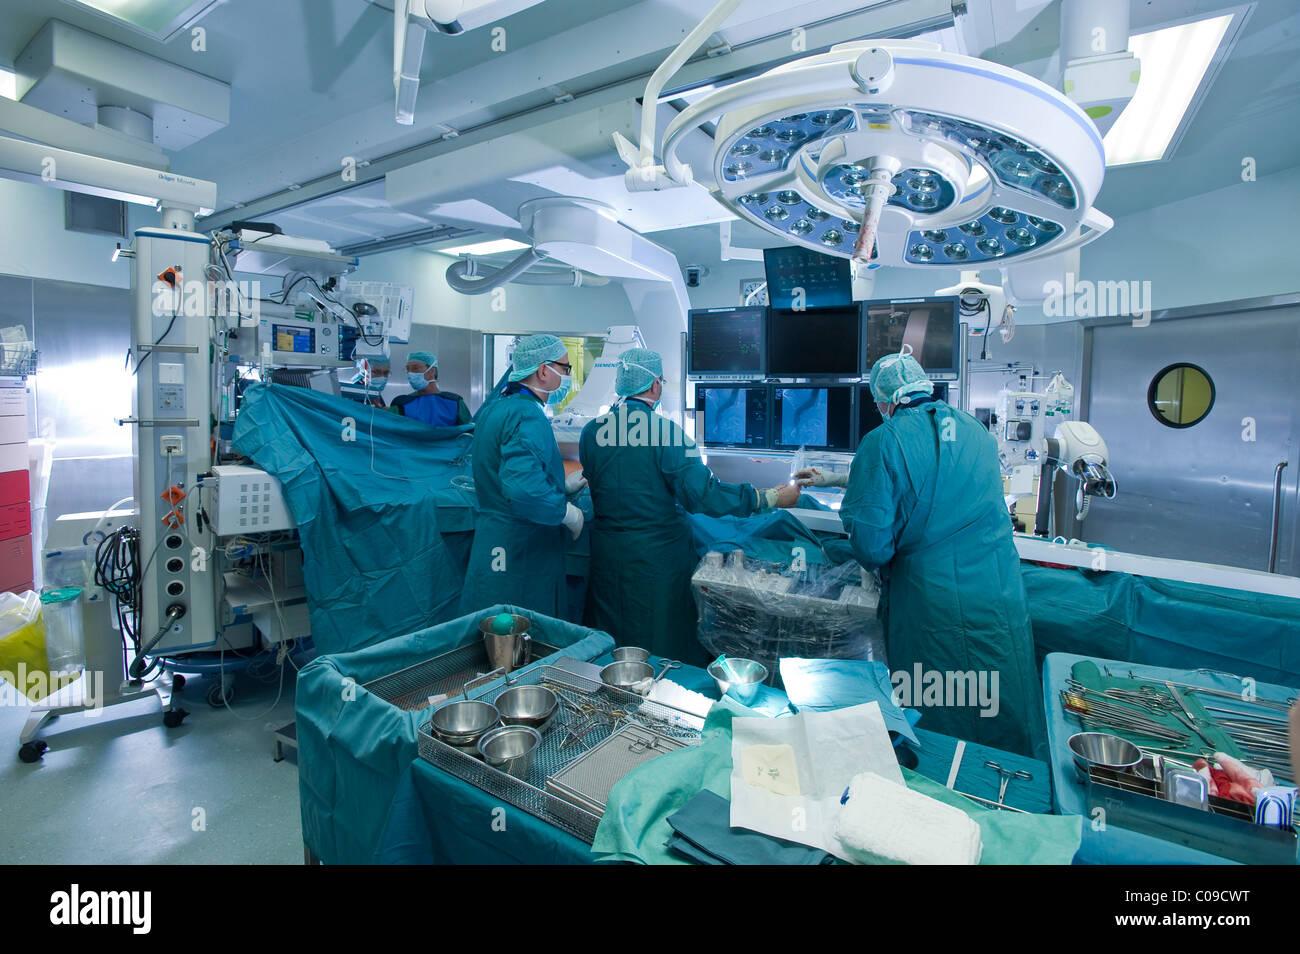 Cardiac surgery in a hybrid operating room, Deutsches Herzzentrum Berlin or German cardiac center, Berlin, Germany, - Stock Image